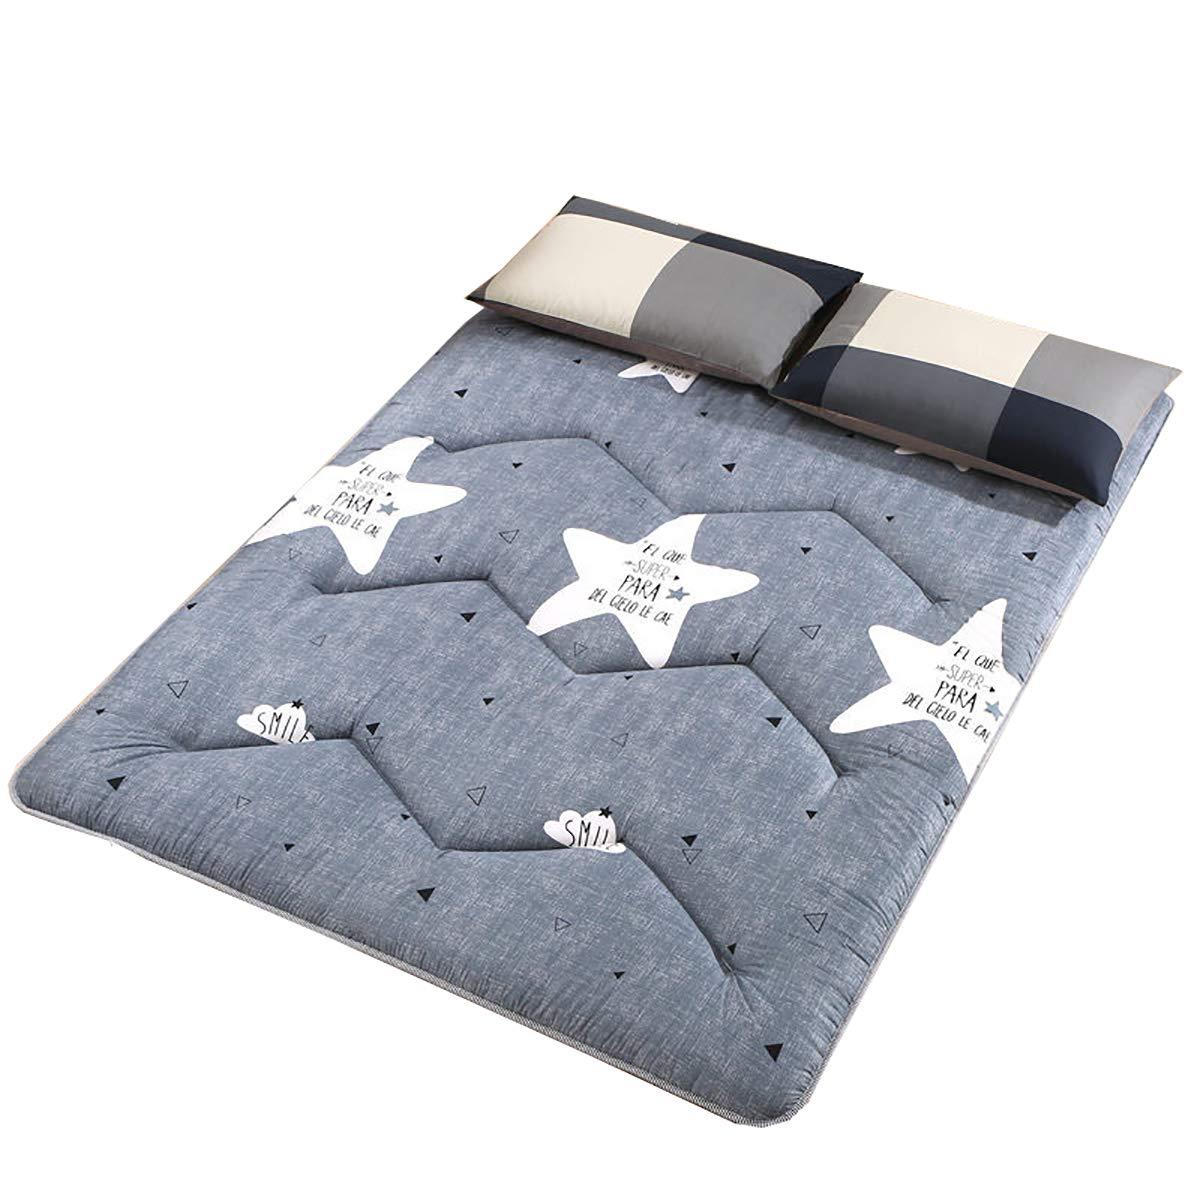 B 90200cm Mattress Topper, Sleeping Tatami Floor mat Quilted Hypoallergenic Folding Futon Mattress Soft Japanese Student Dormitory Mattress Pad,F,180  200cm